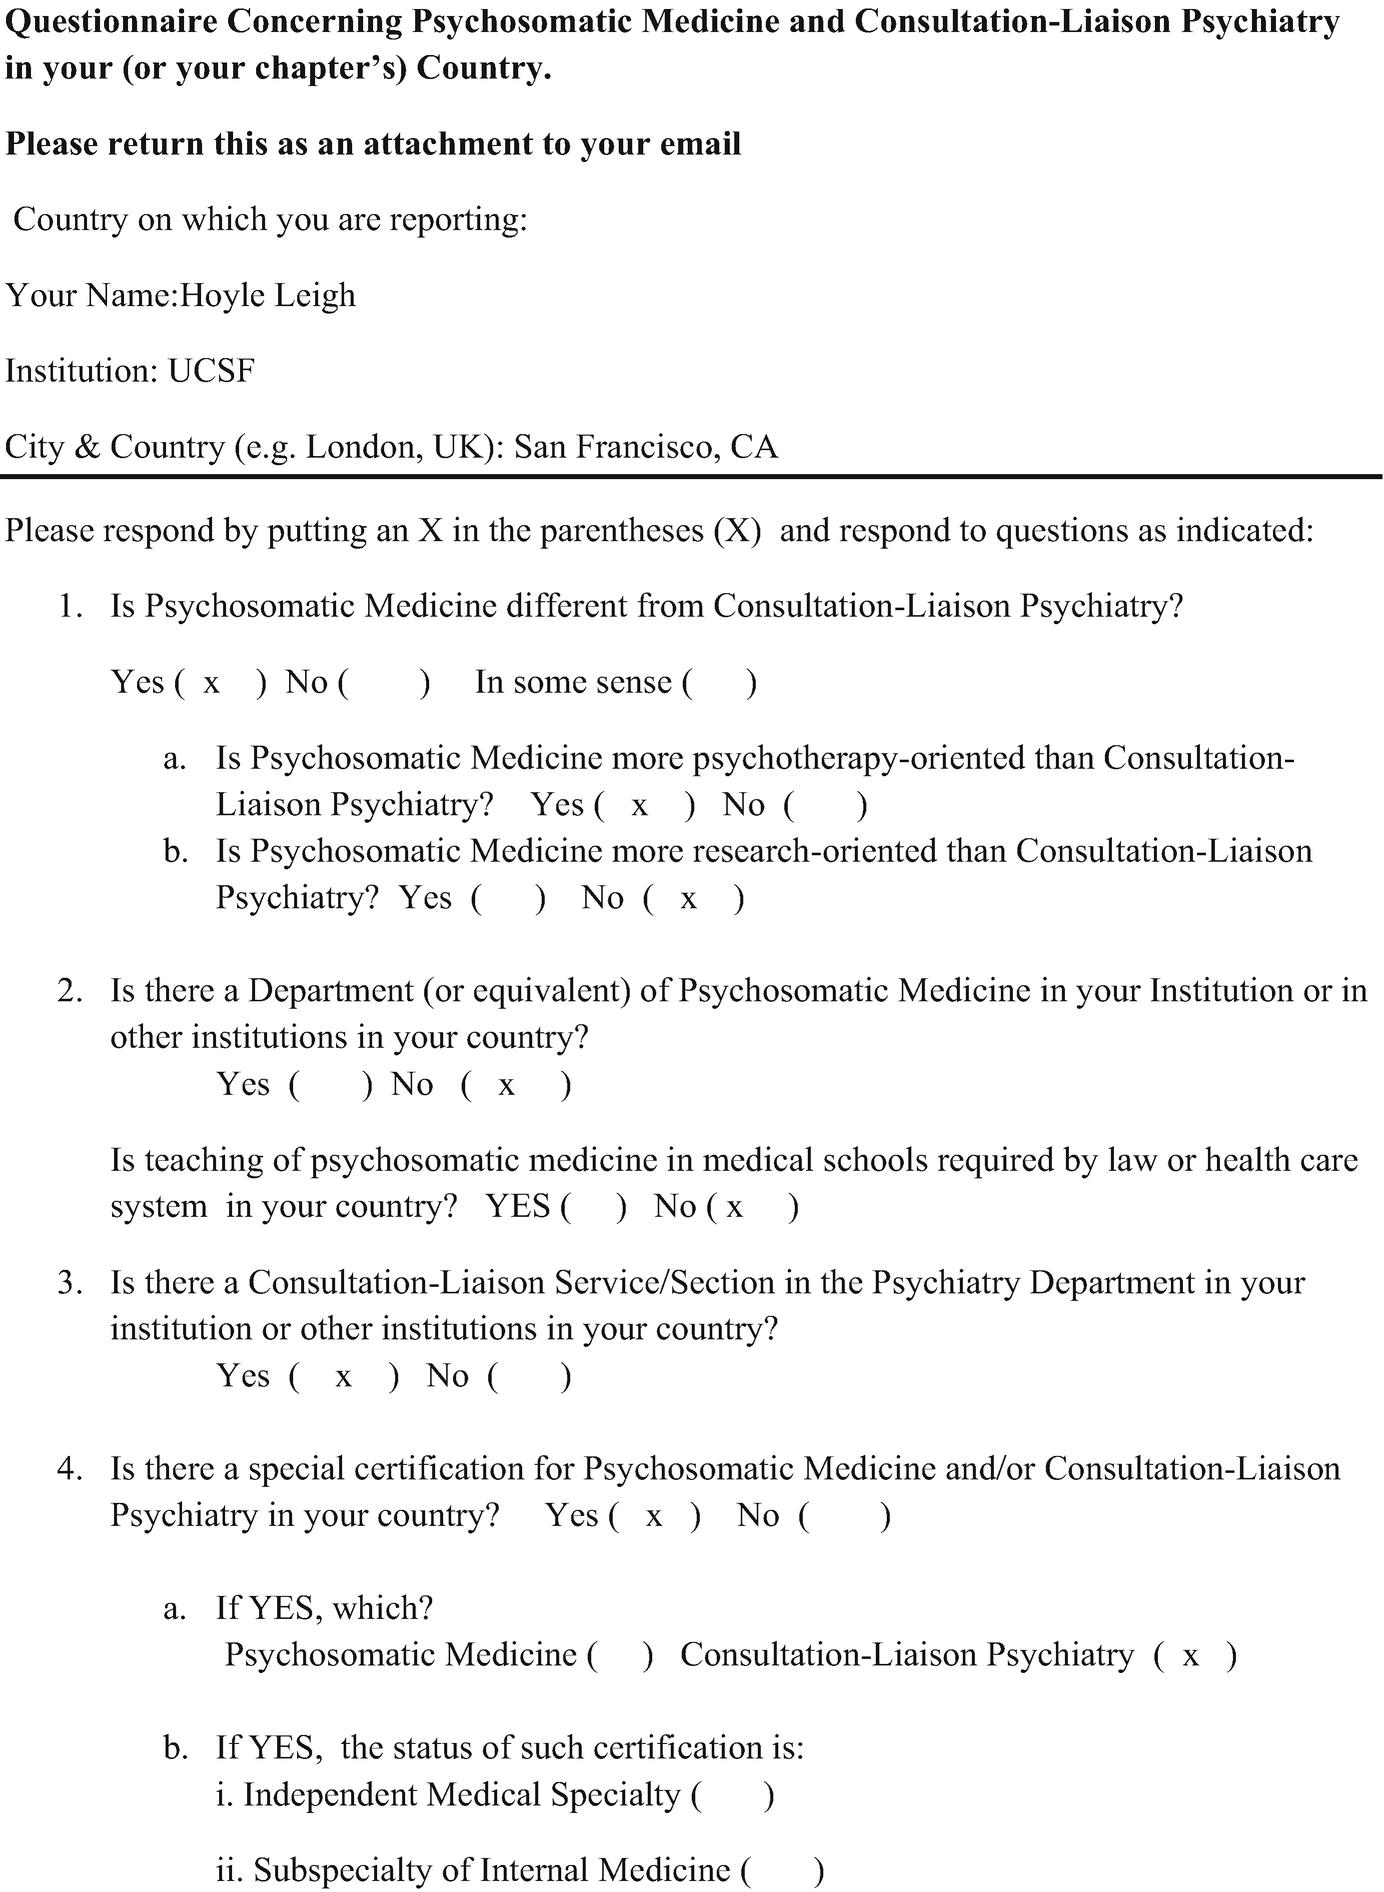 Psychosomatic Medicine and Consultation-Liaison Psychiatry